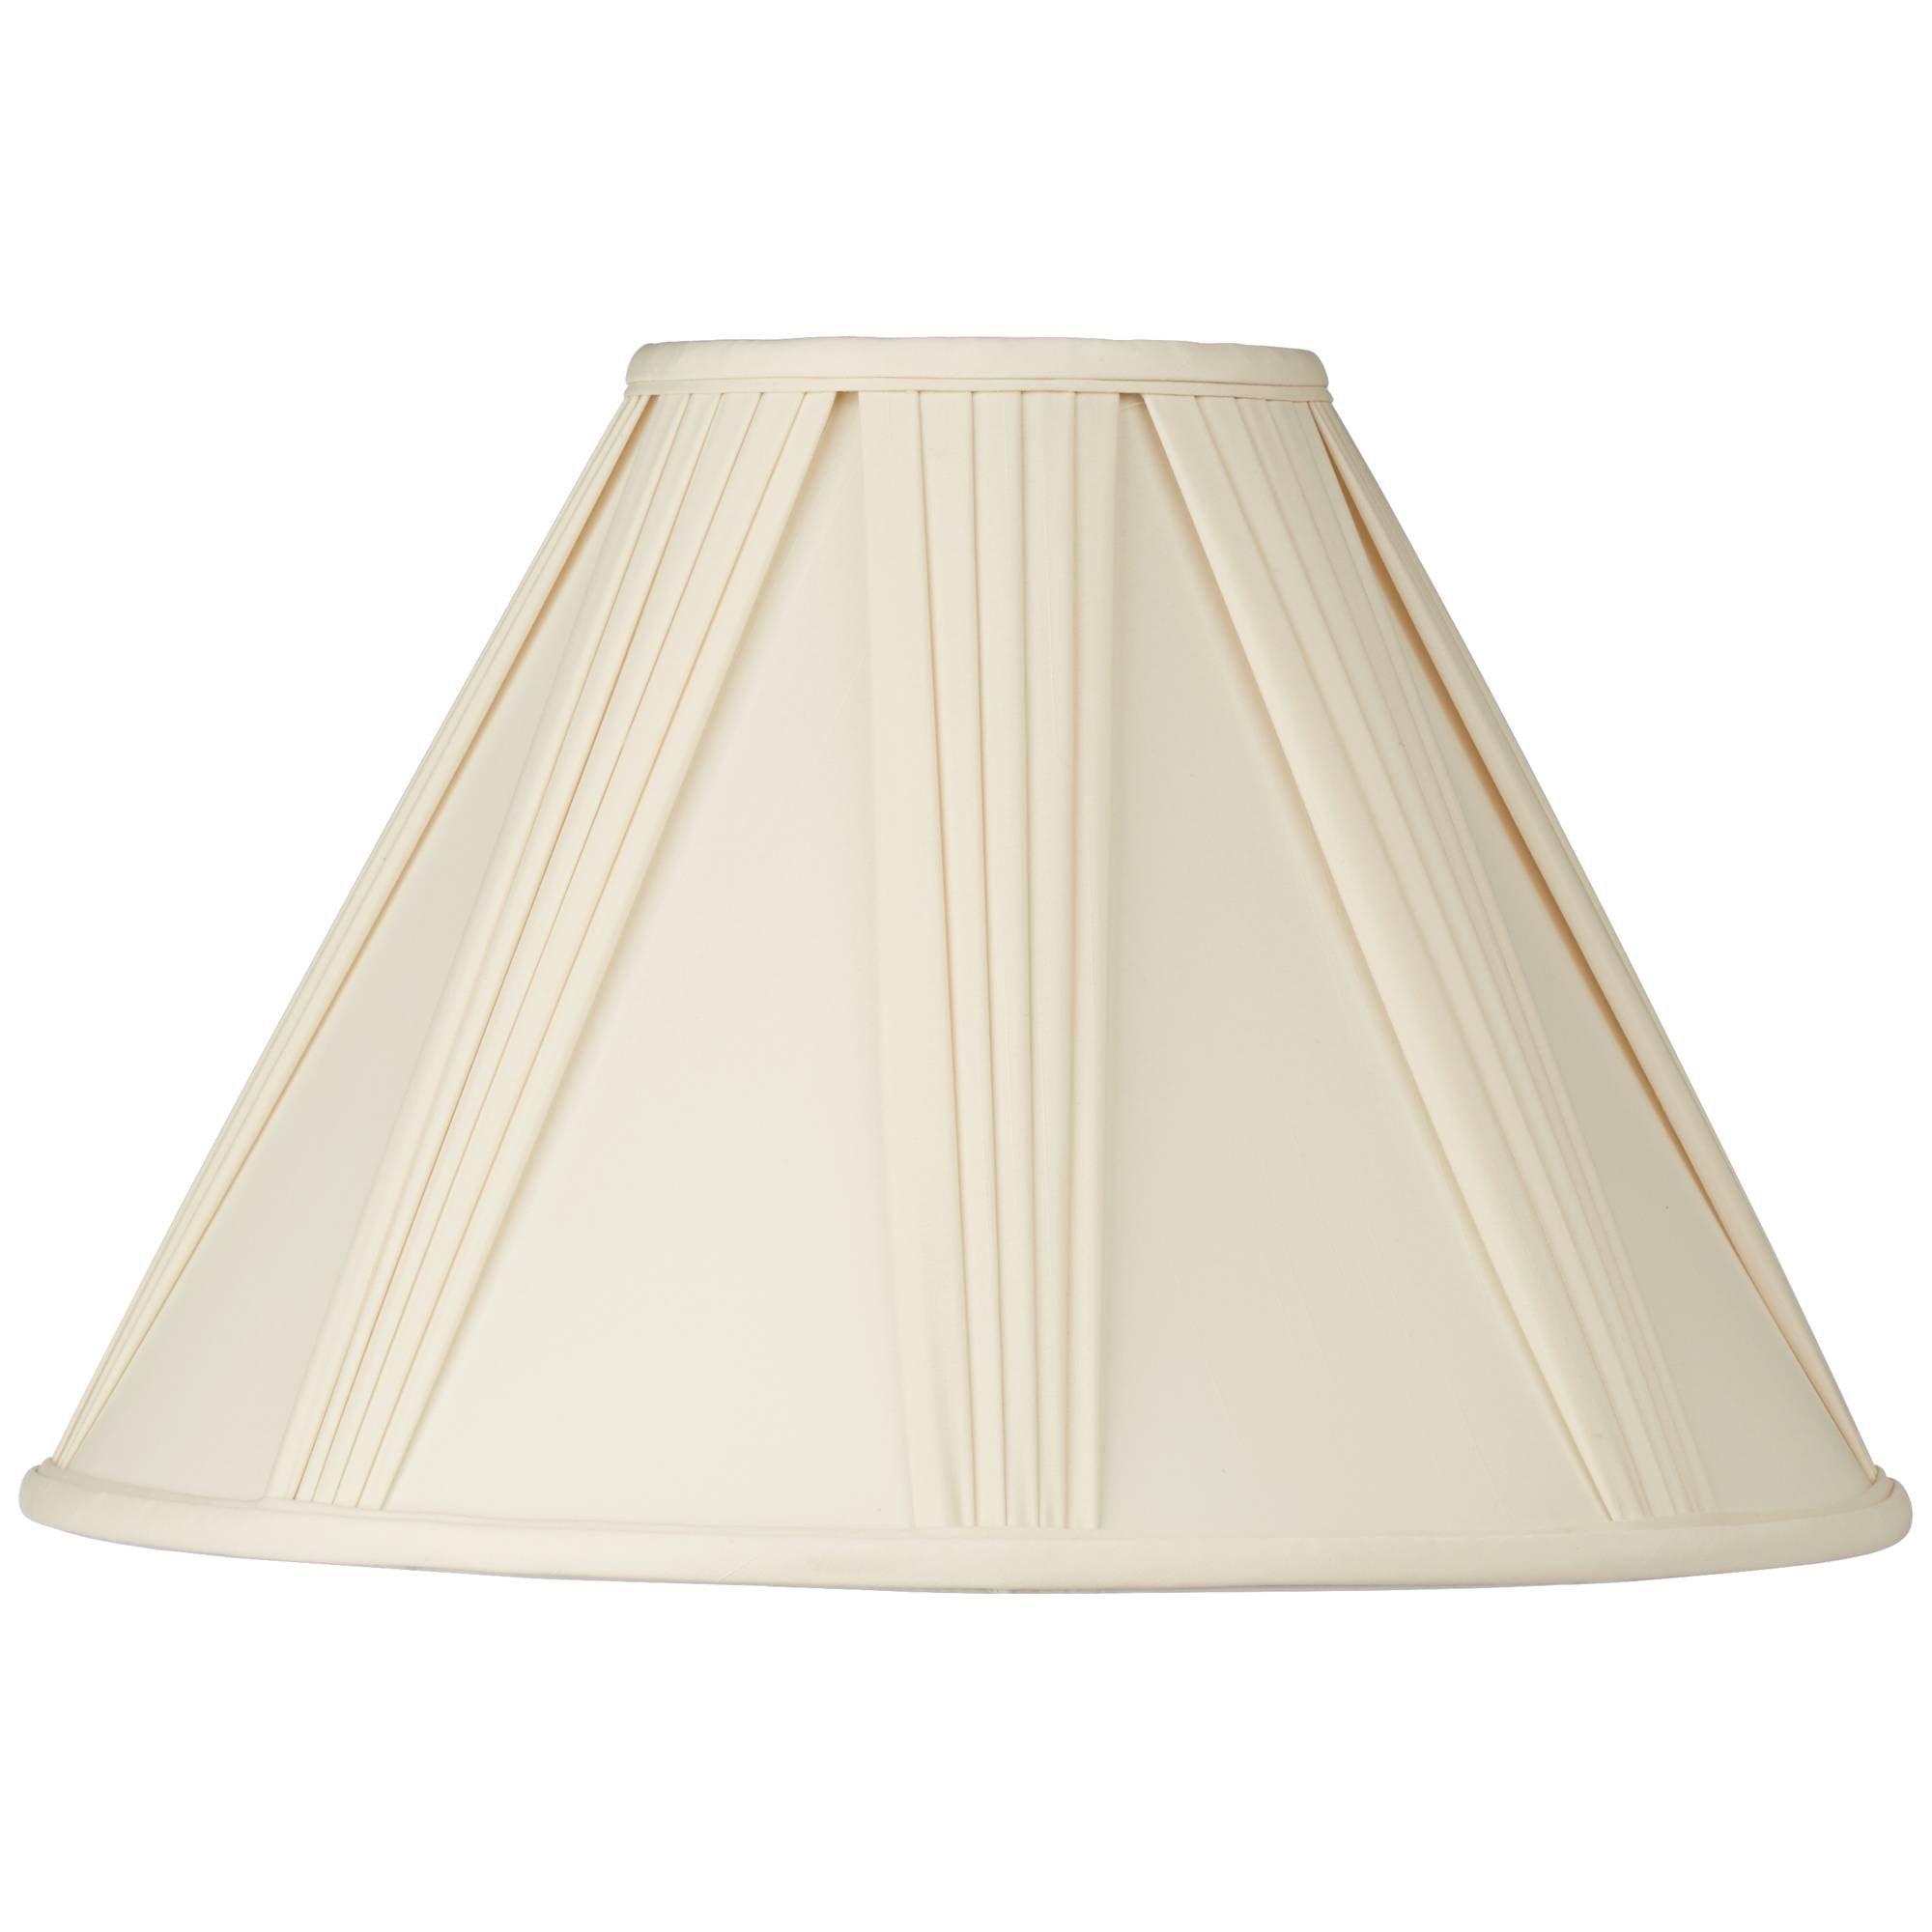 Springcrest Ivory Lamp Shade 6x17x12 (Spider) - Springcrest